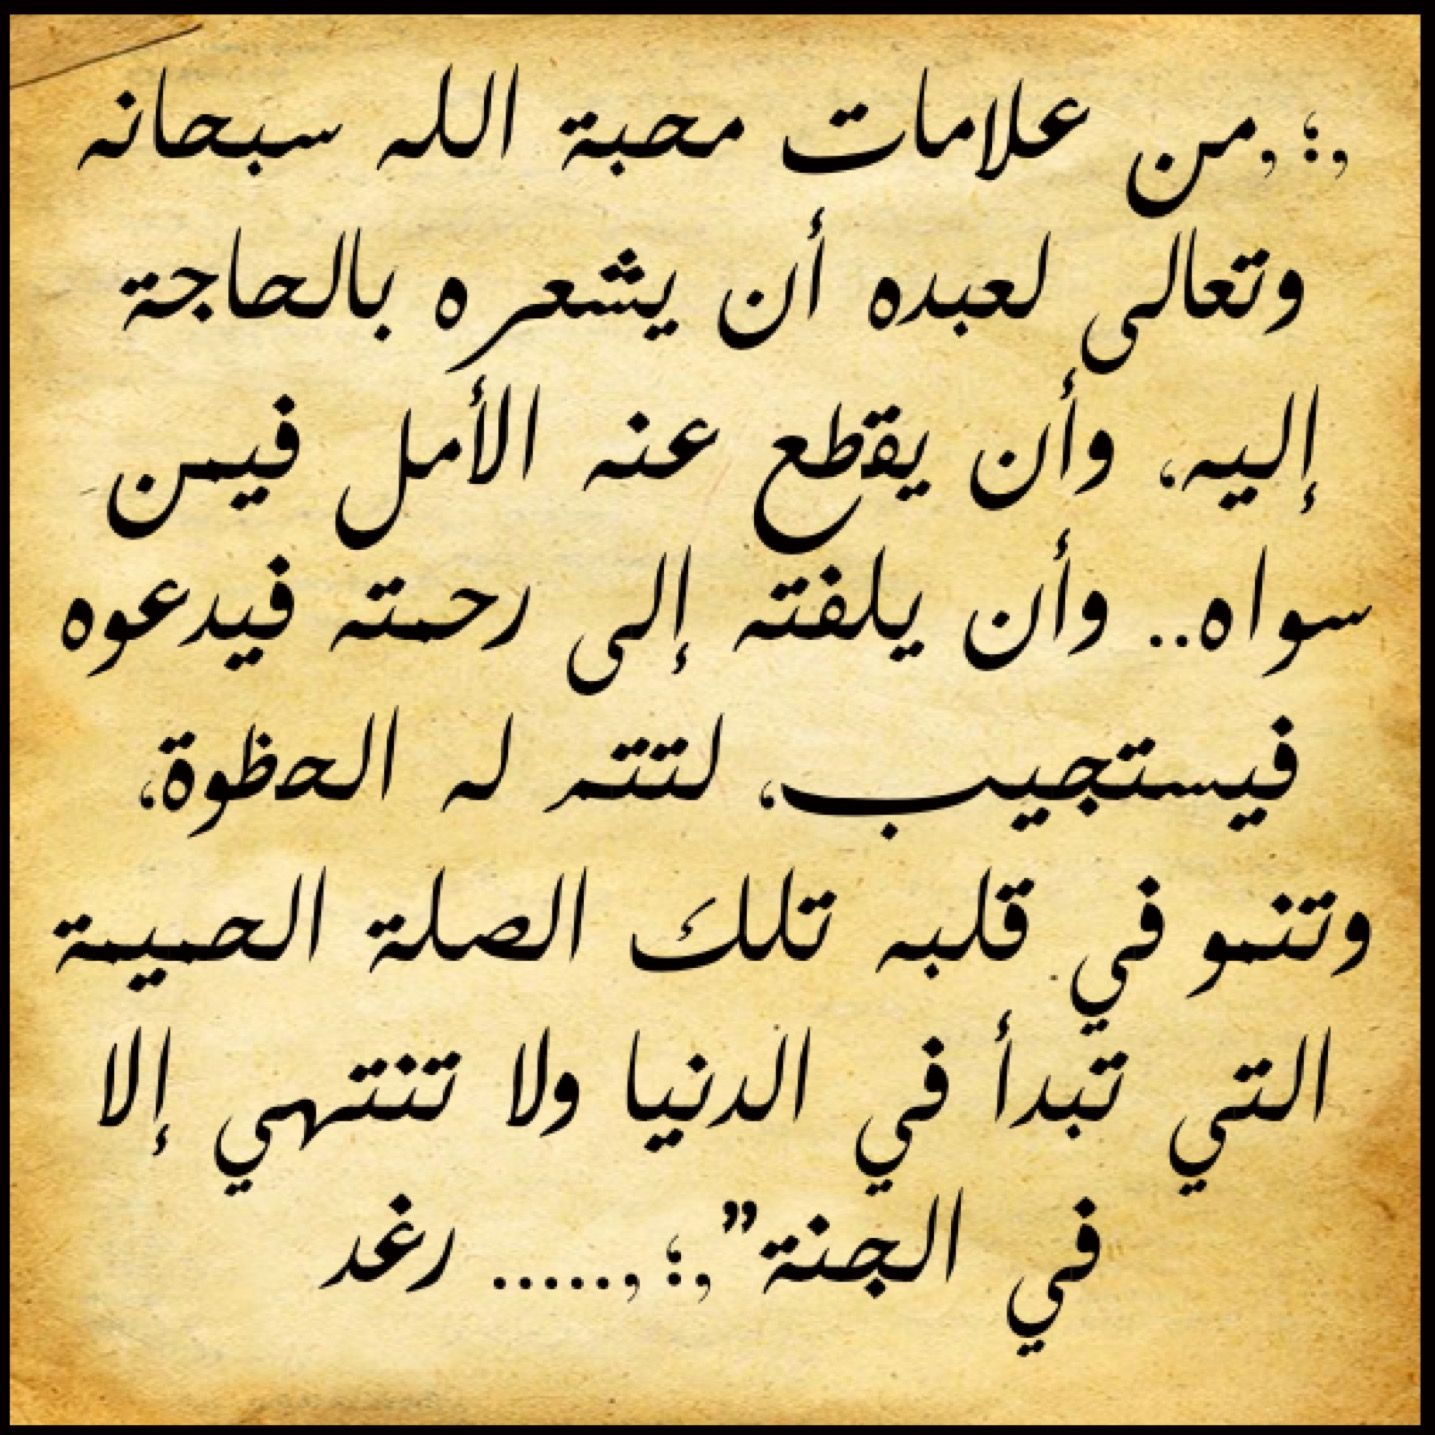 Desertrose من علامات محبة الله سبحانه وتعالى لعبده Islamic Quotes Quran Verses Beautiful Words